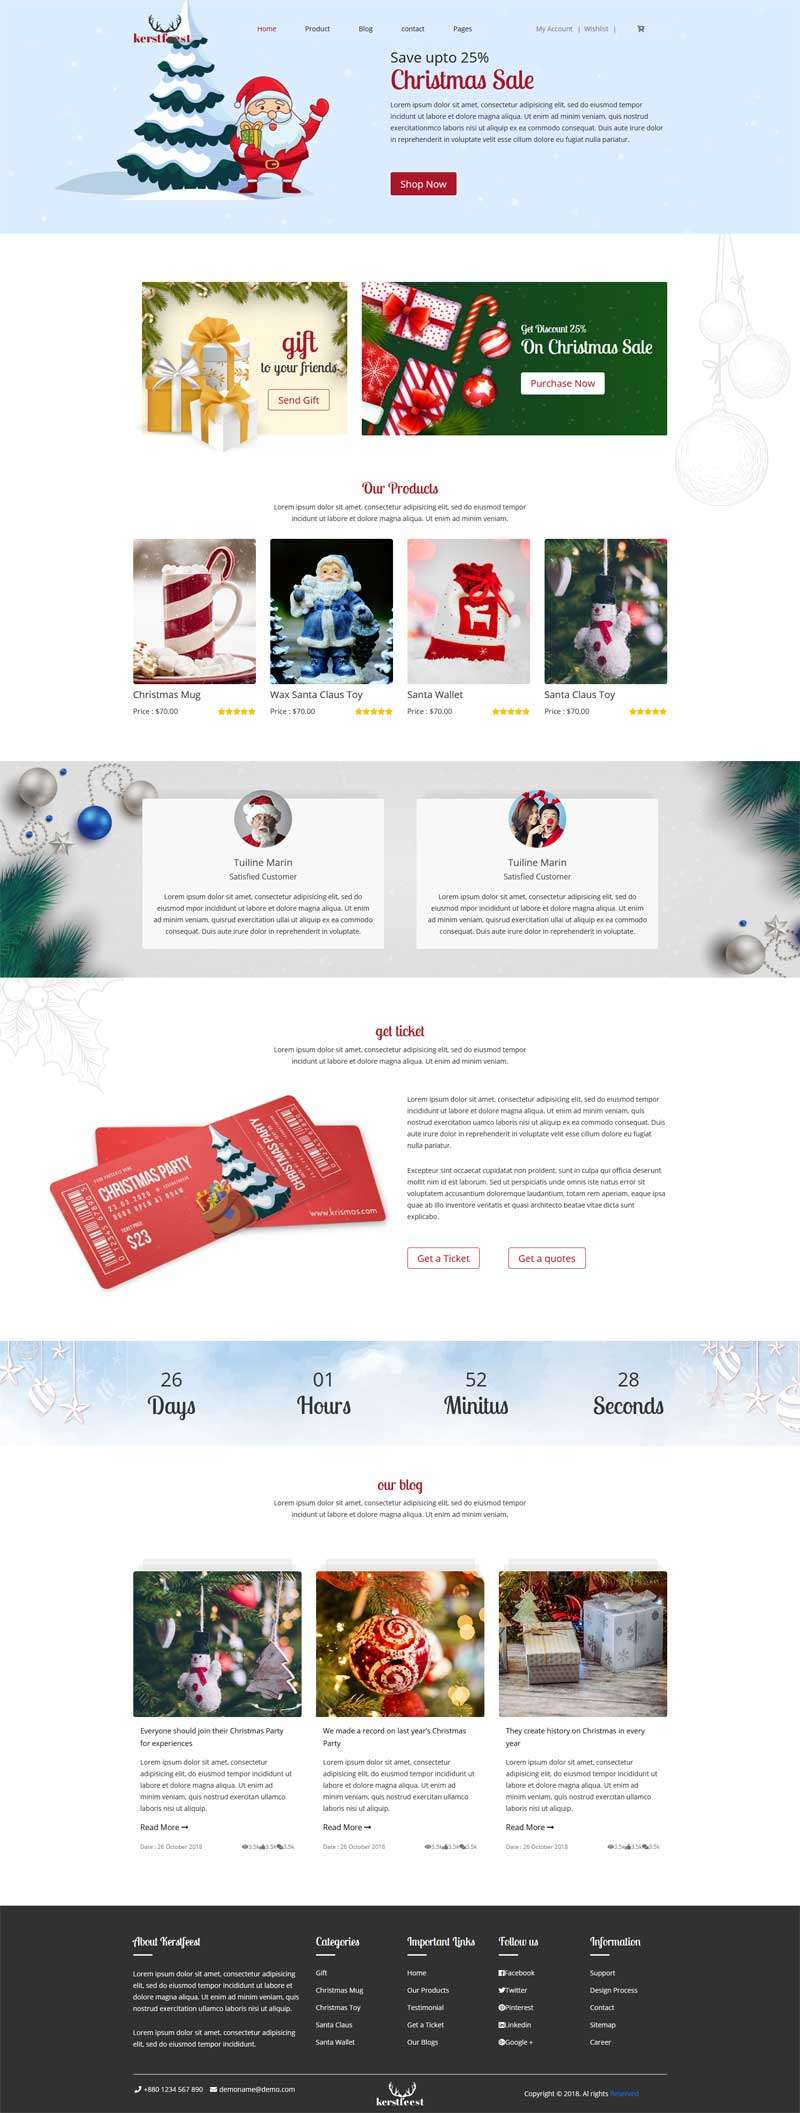 Bootstrap圣诞节主题商城网站模板